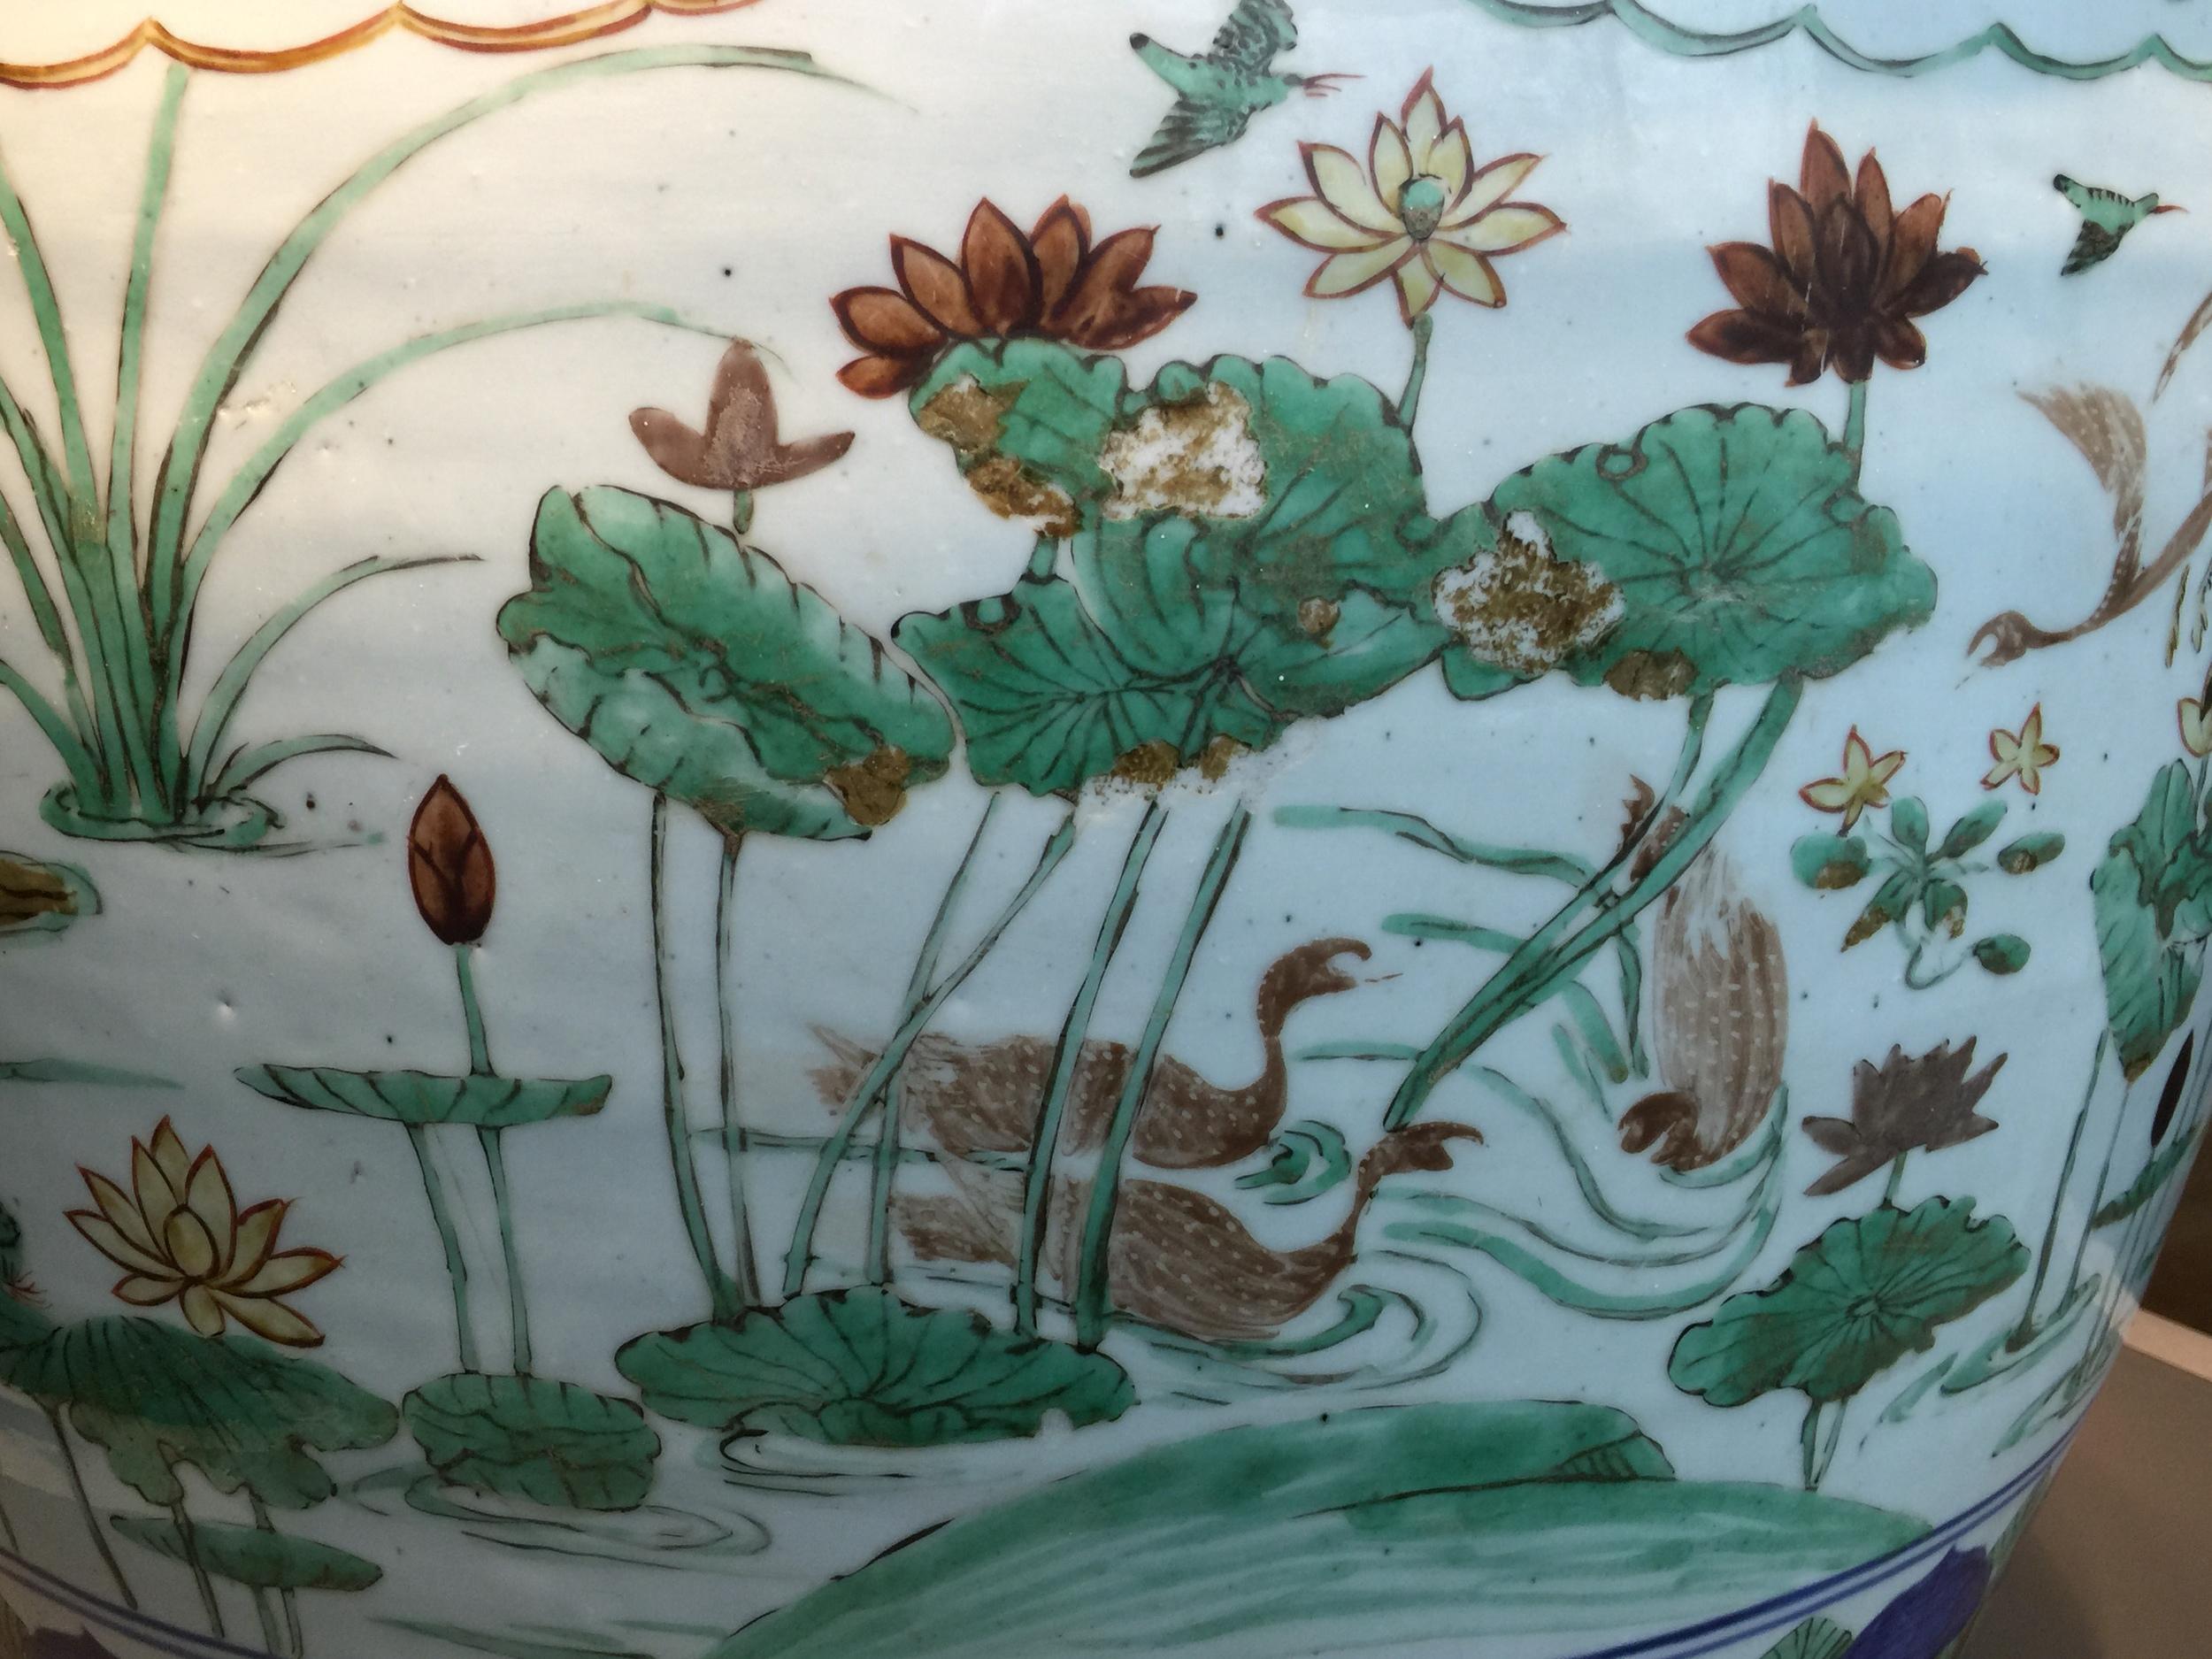 Chinese-Porcelain-British-Museum-Percival-David-jessewaugh.com-28.jpg